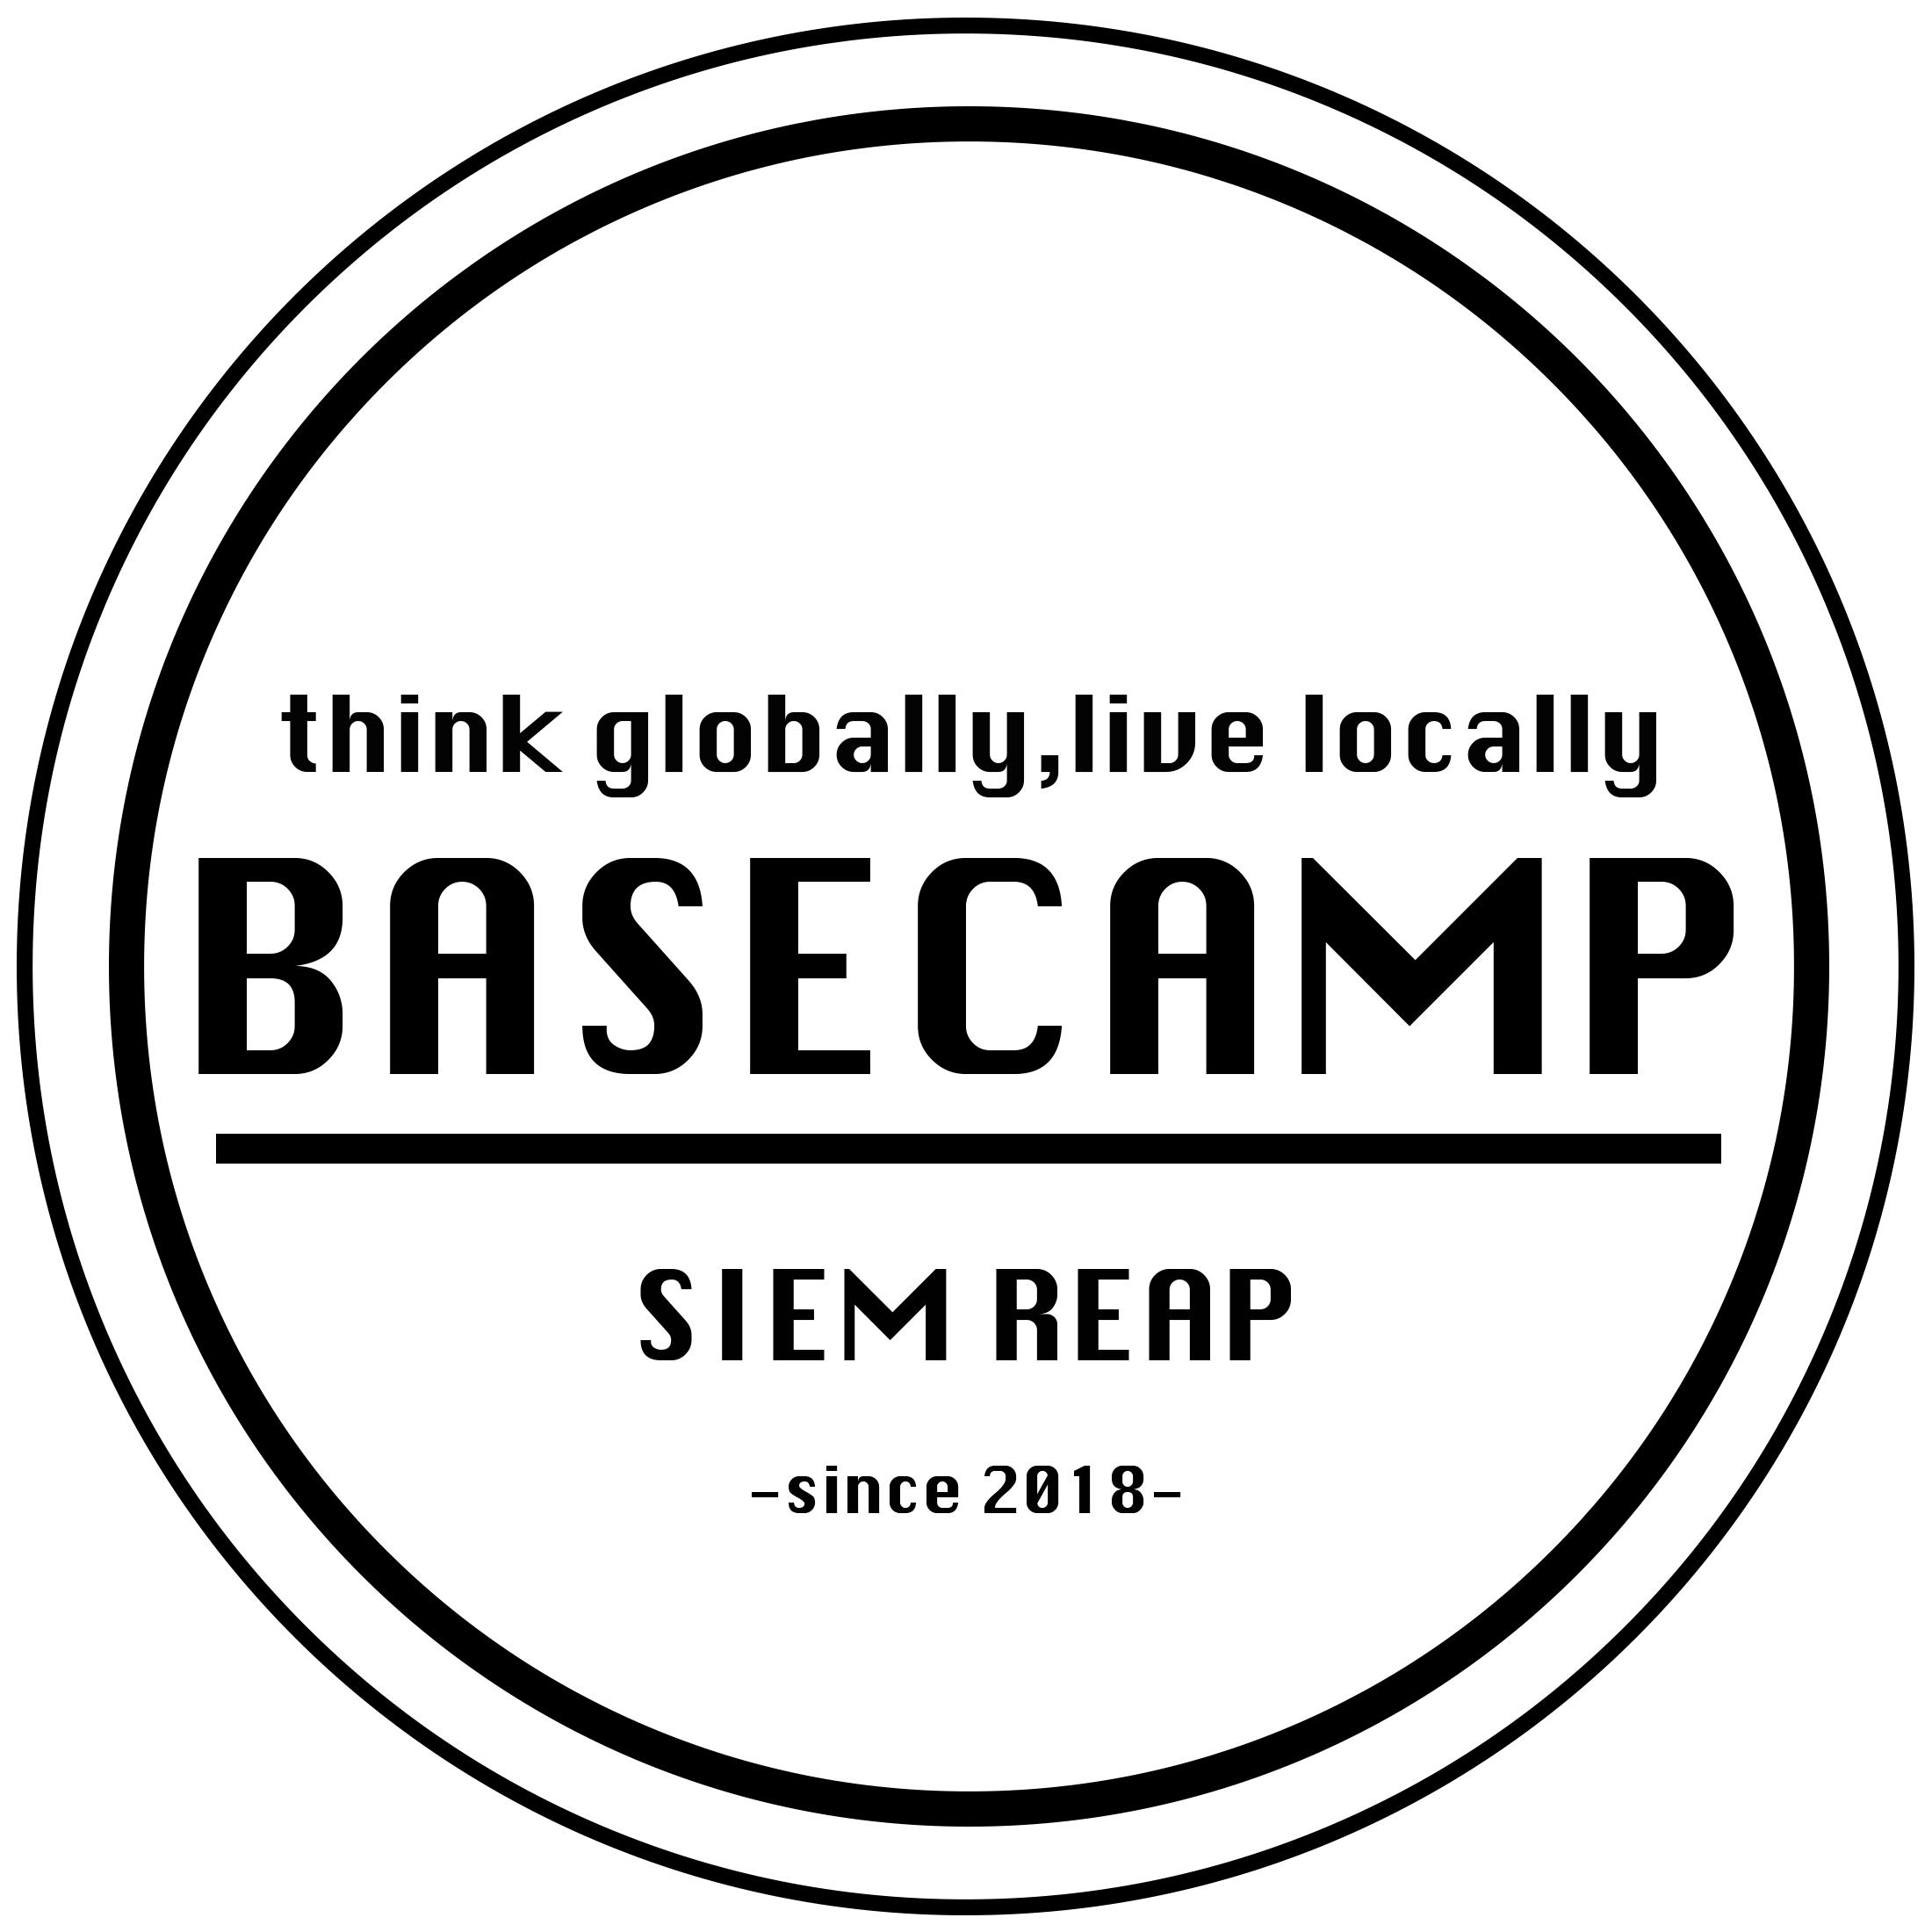 BASECAMP SIEMREAPのロゴアイコン